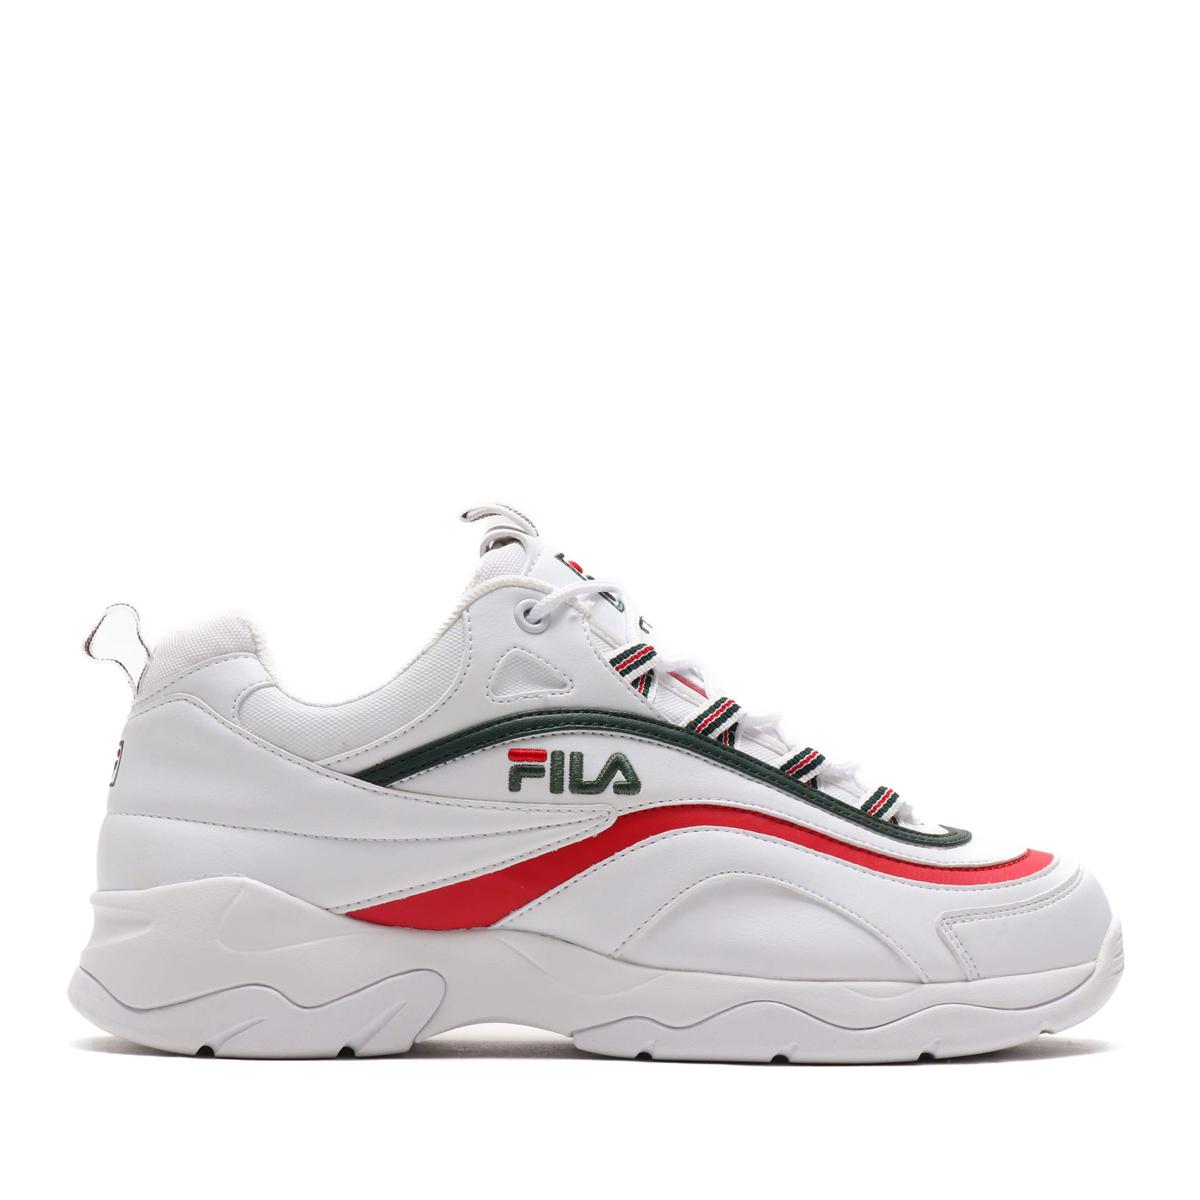 FILA RAY(WH/SYCA/FR)(フィラ レイ)【メンズ】【スニーカー】【19SS-S】